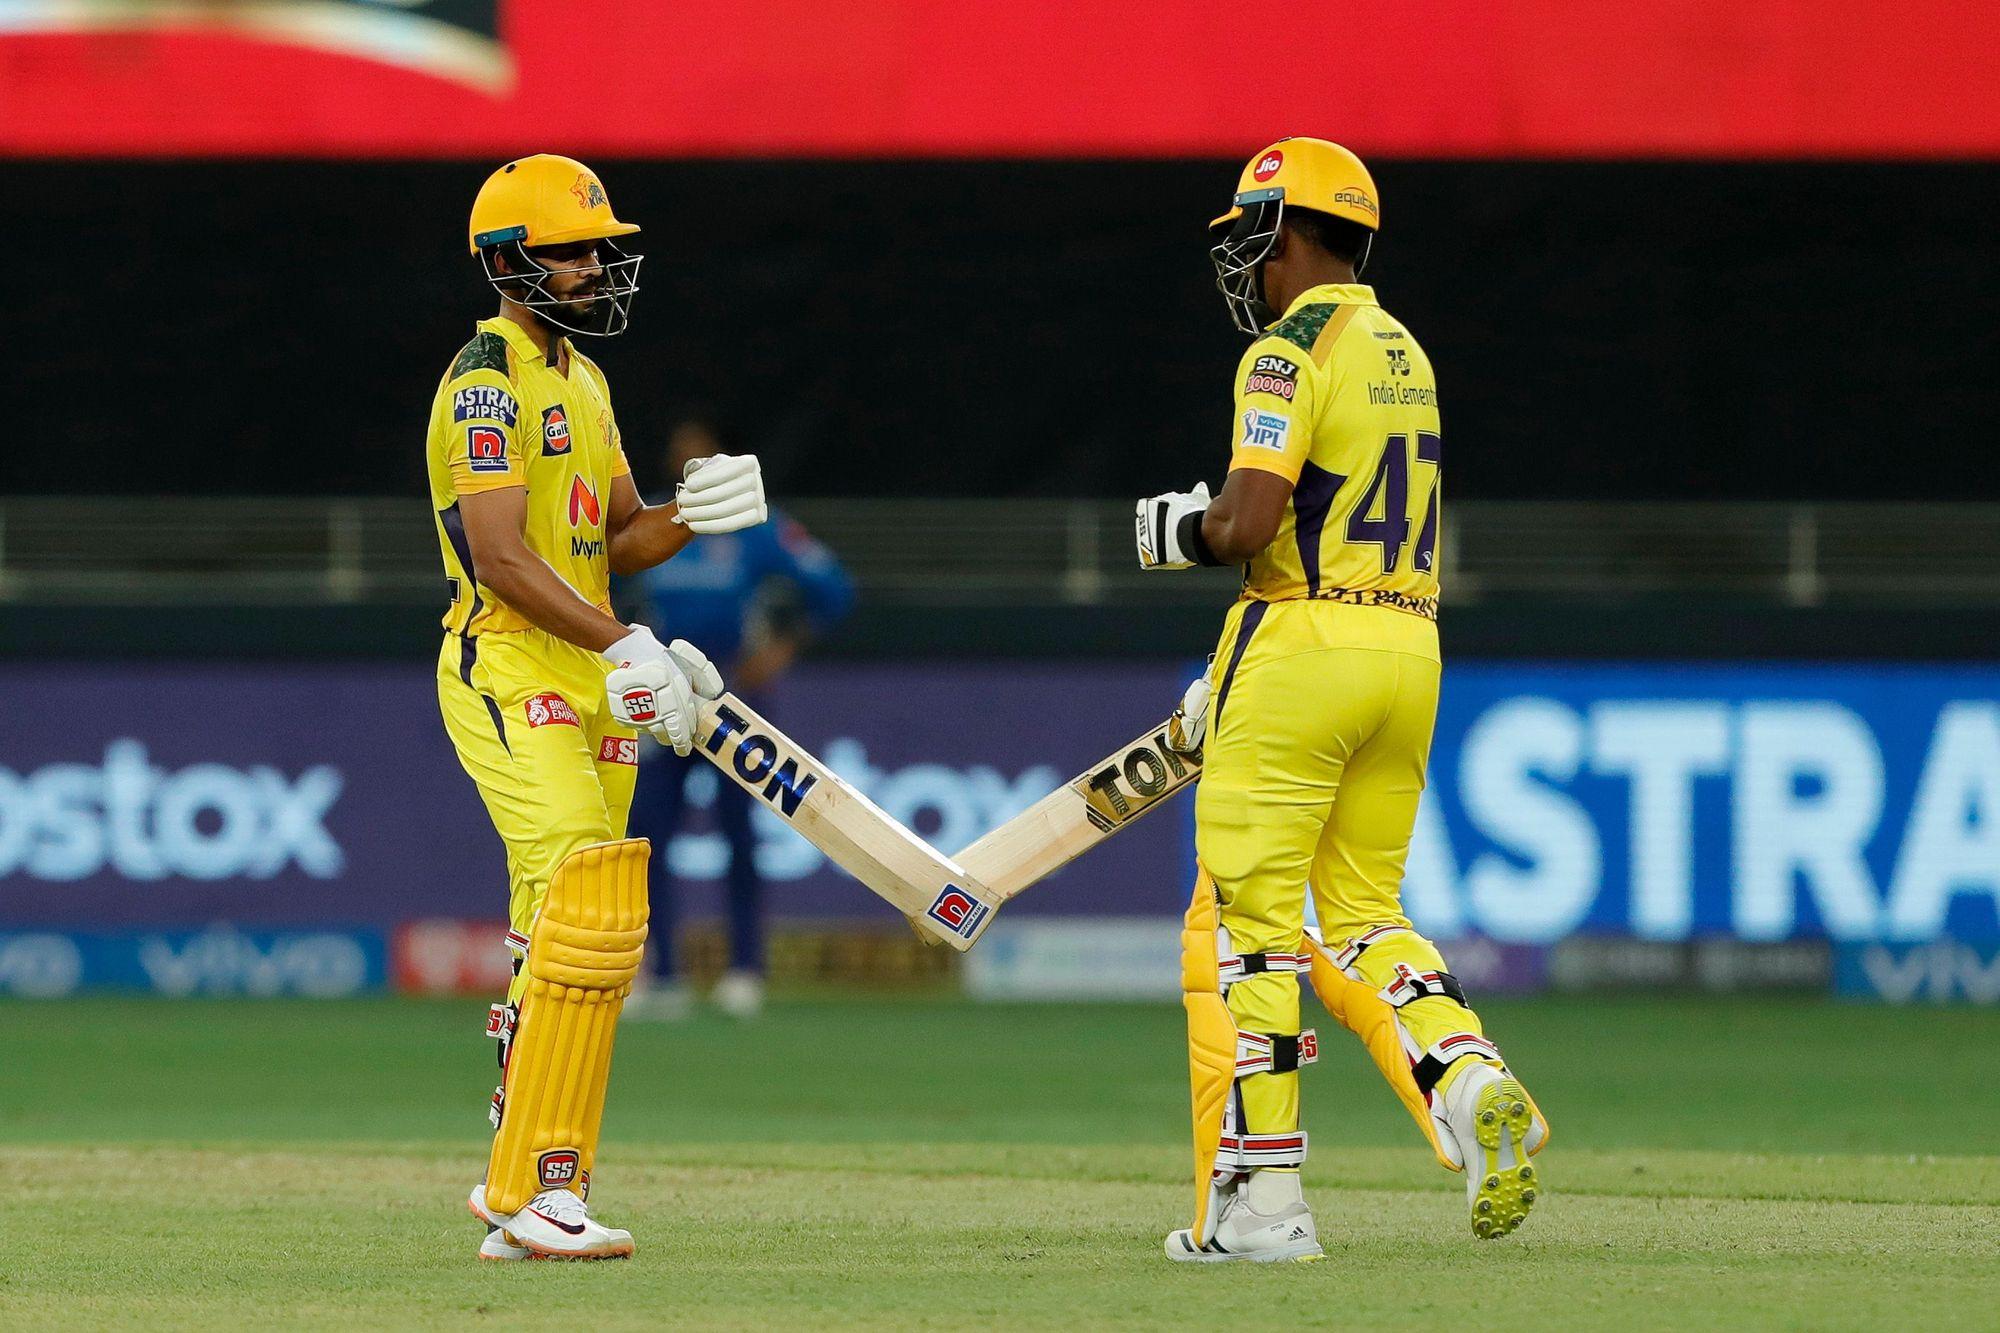 Ruturaj Gaikwad and Dwayne Bravo starred for CSK   BCCI/IPL